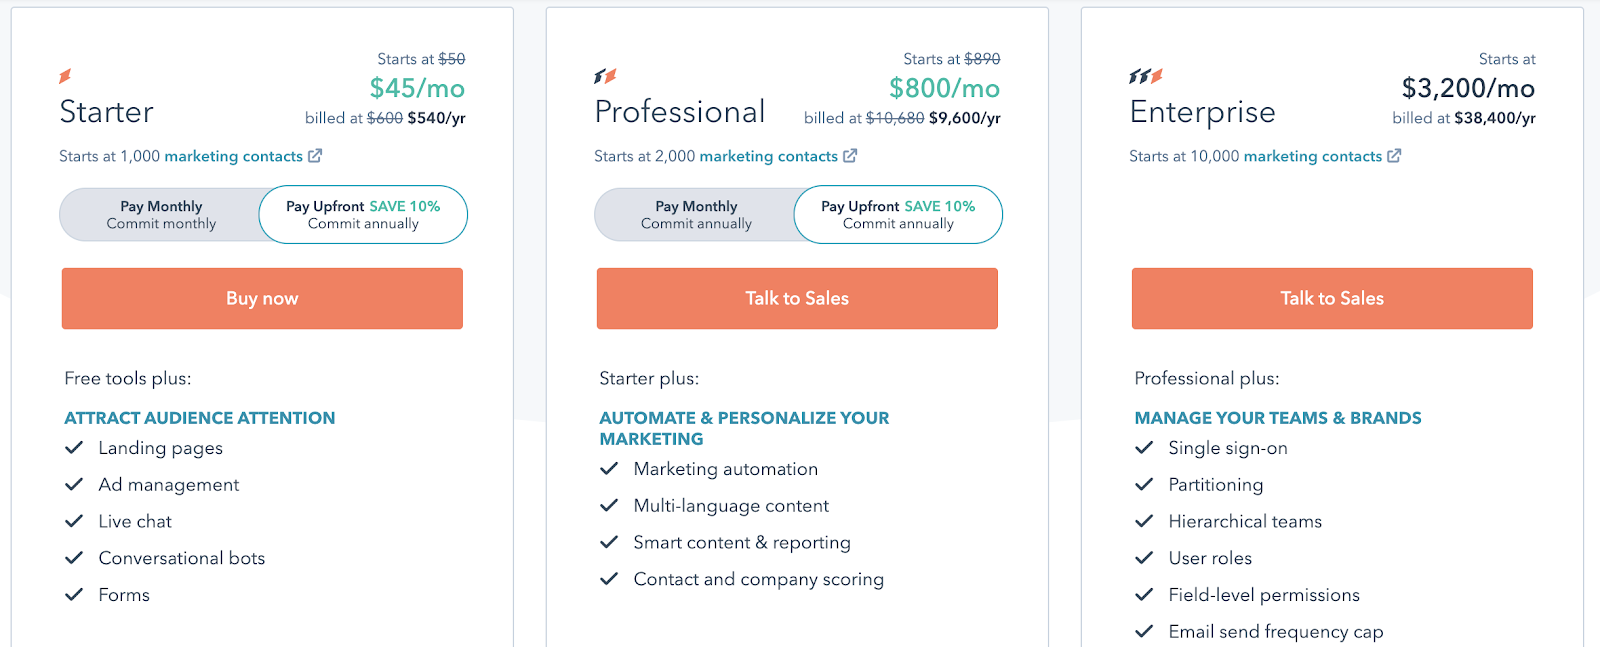 Hubspot pricing plans - Starter, Professional, Enterprise